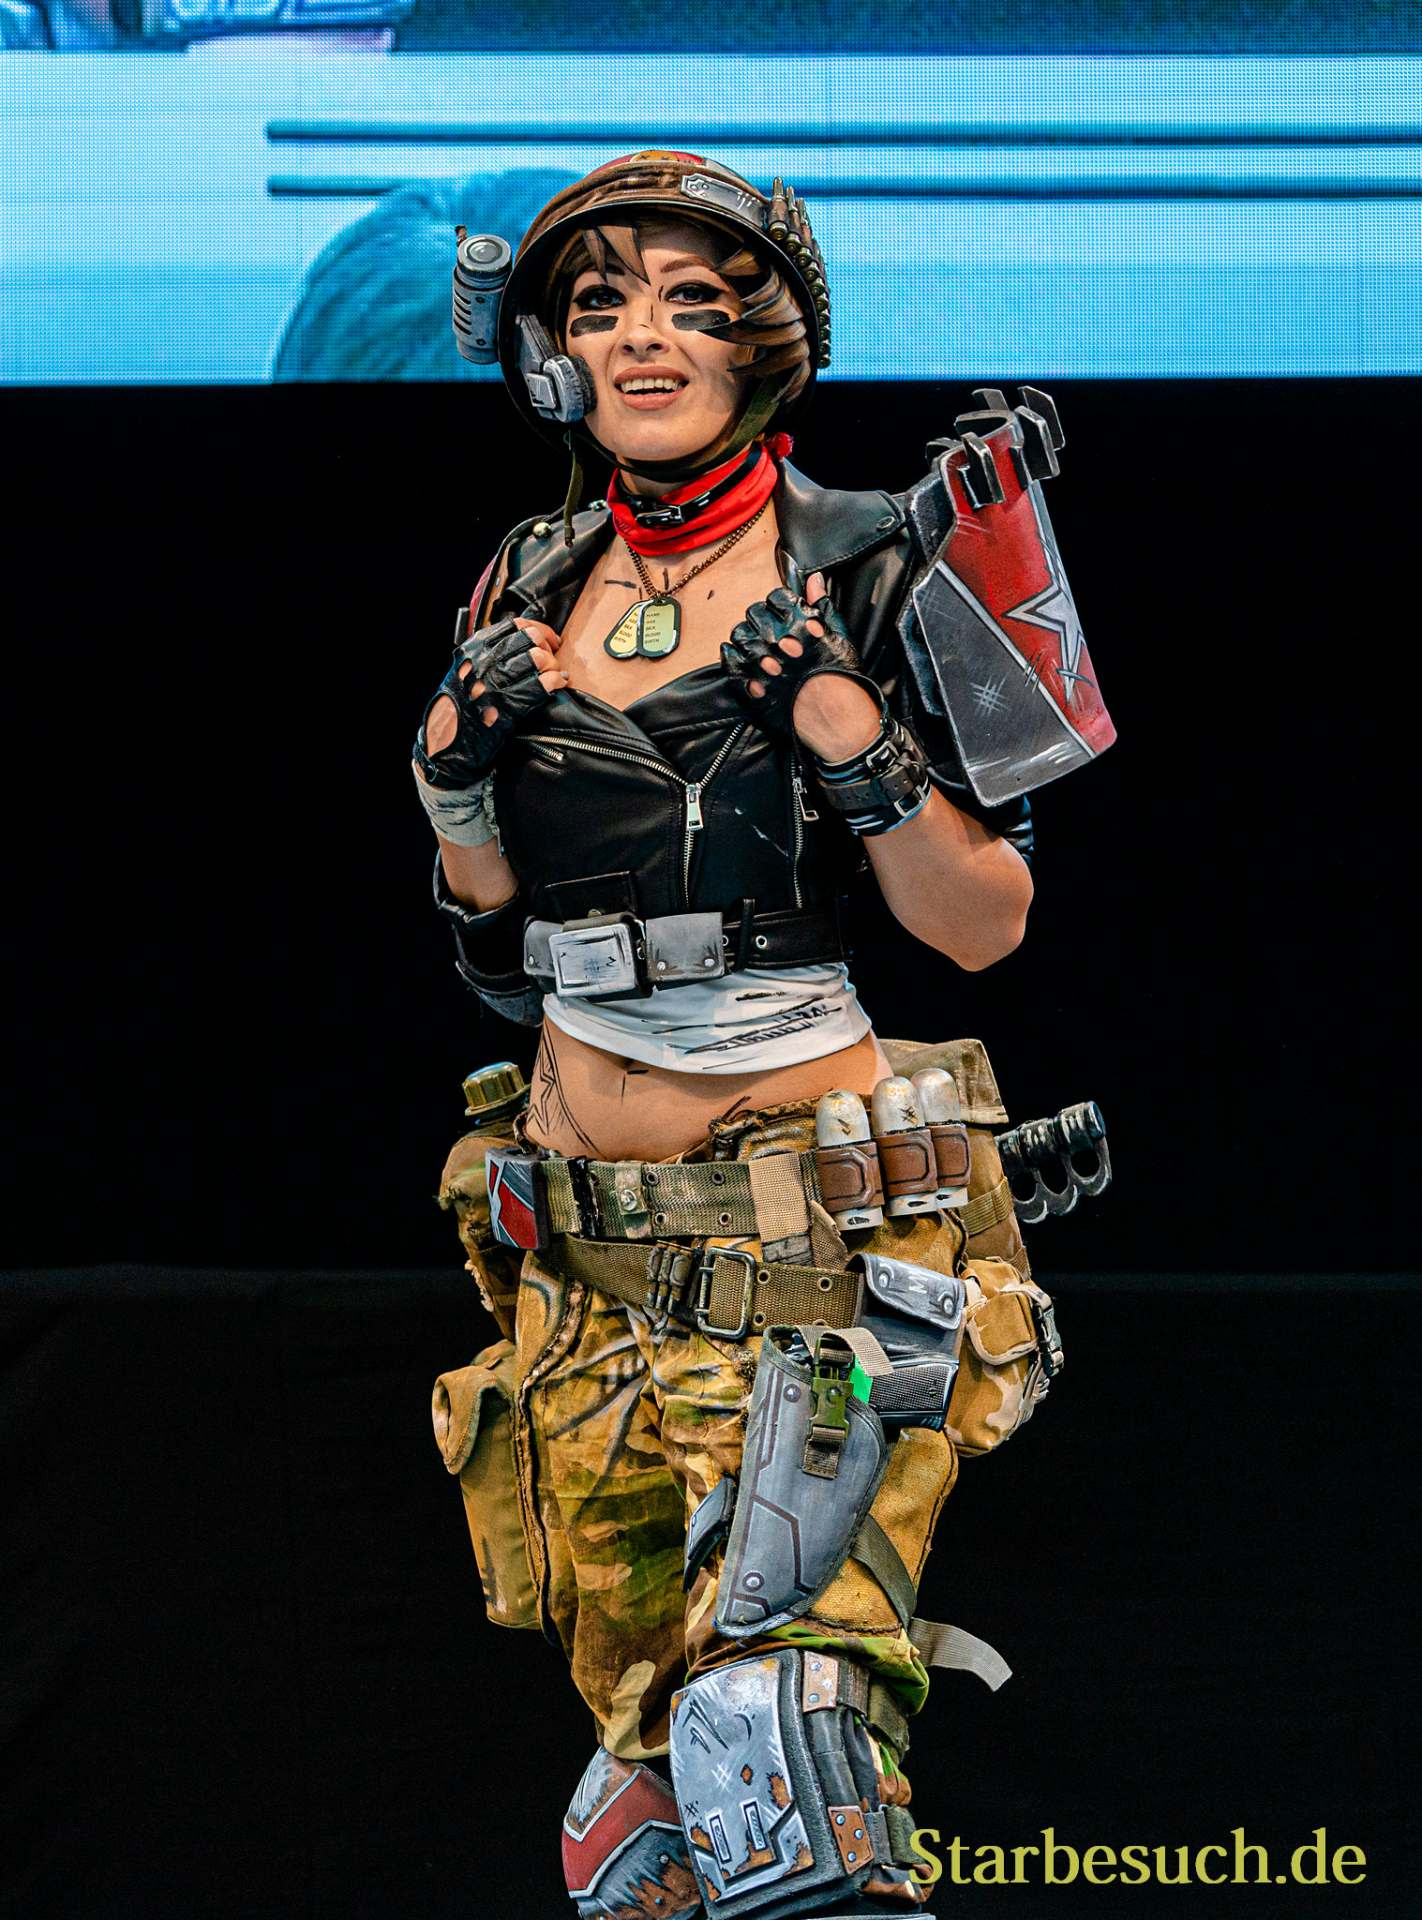 Cosplay Contest: #3 Shizolady as Moze from Borderlands 3